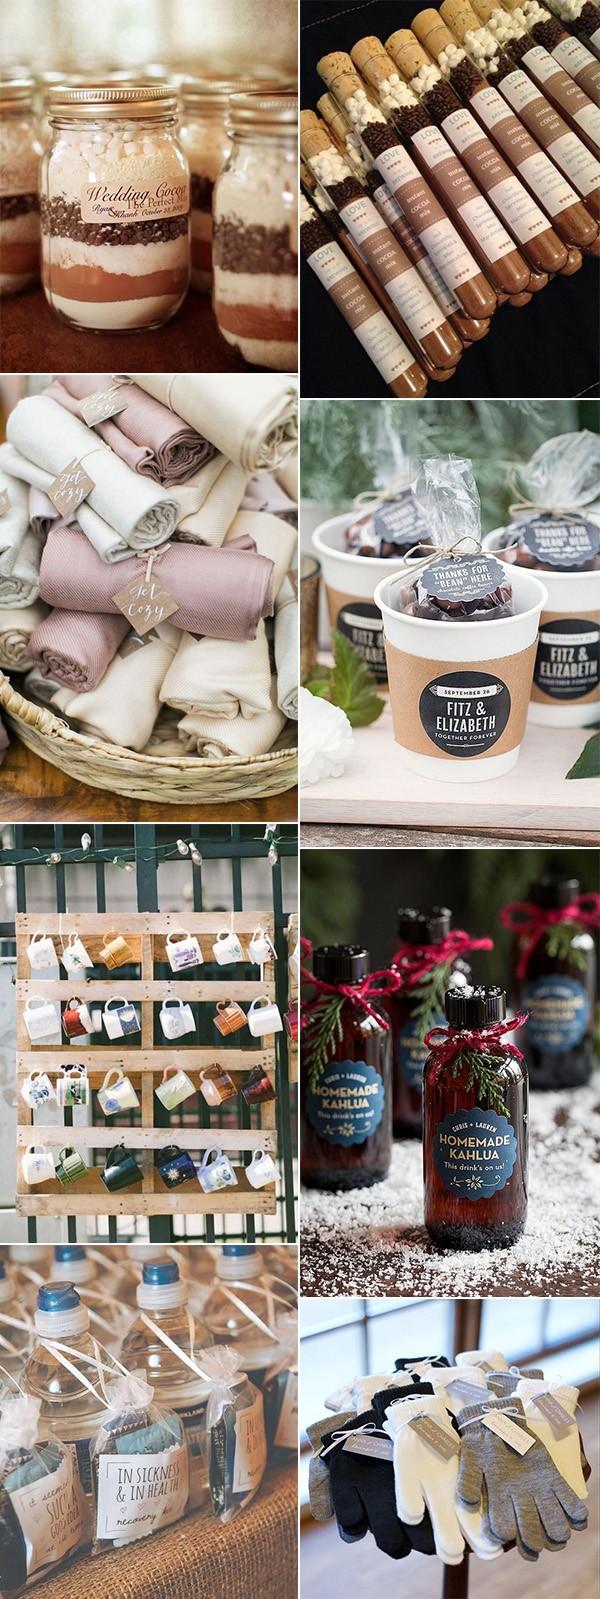 wedding favor ideas for winter